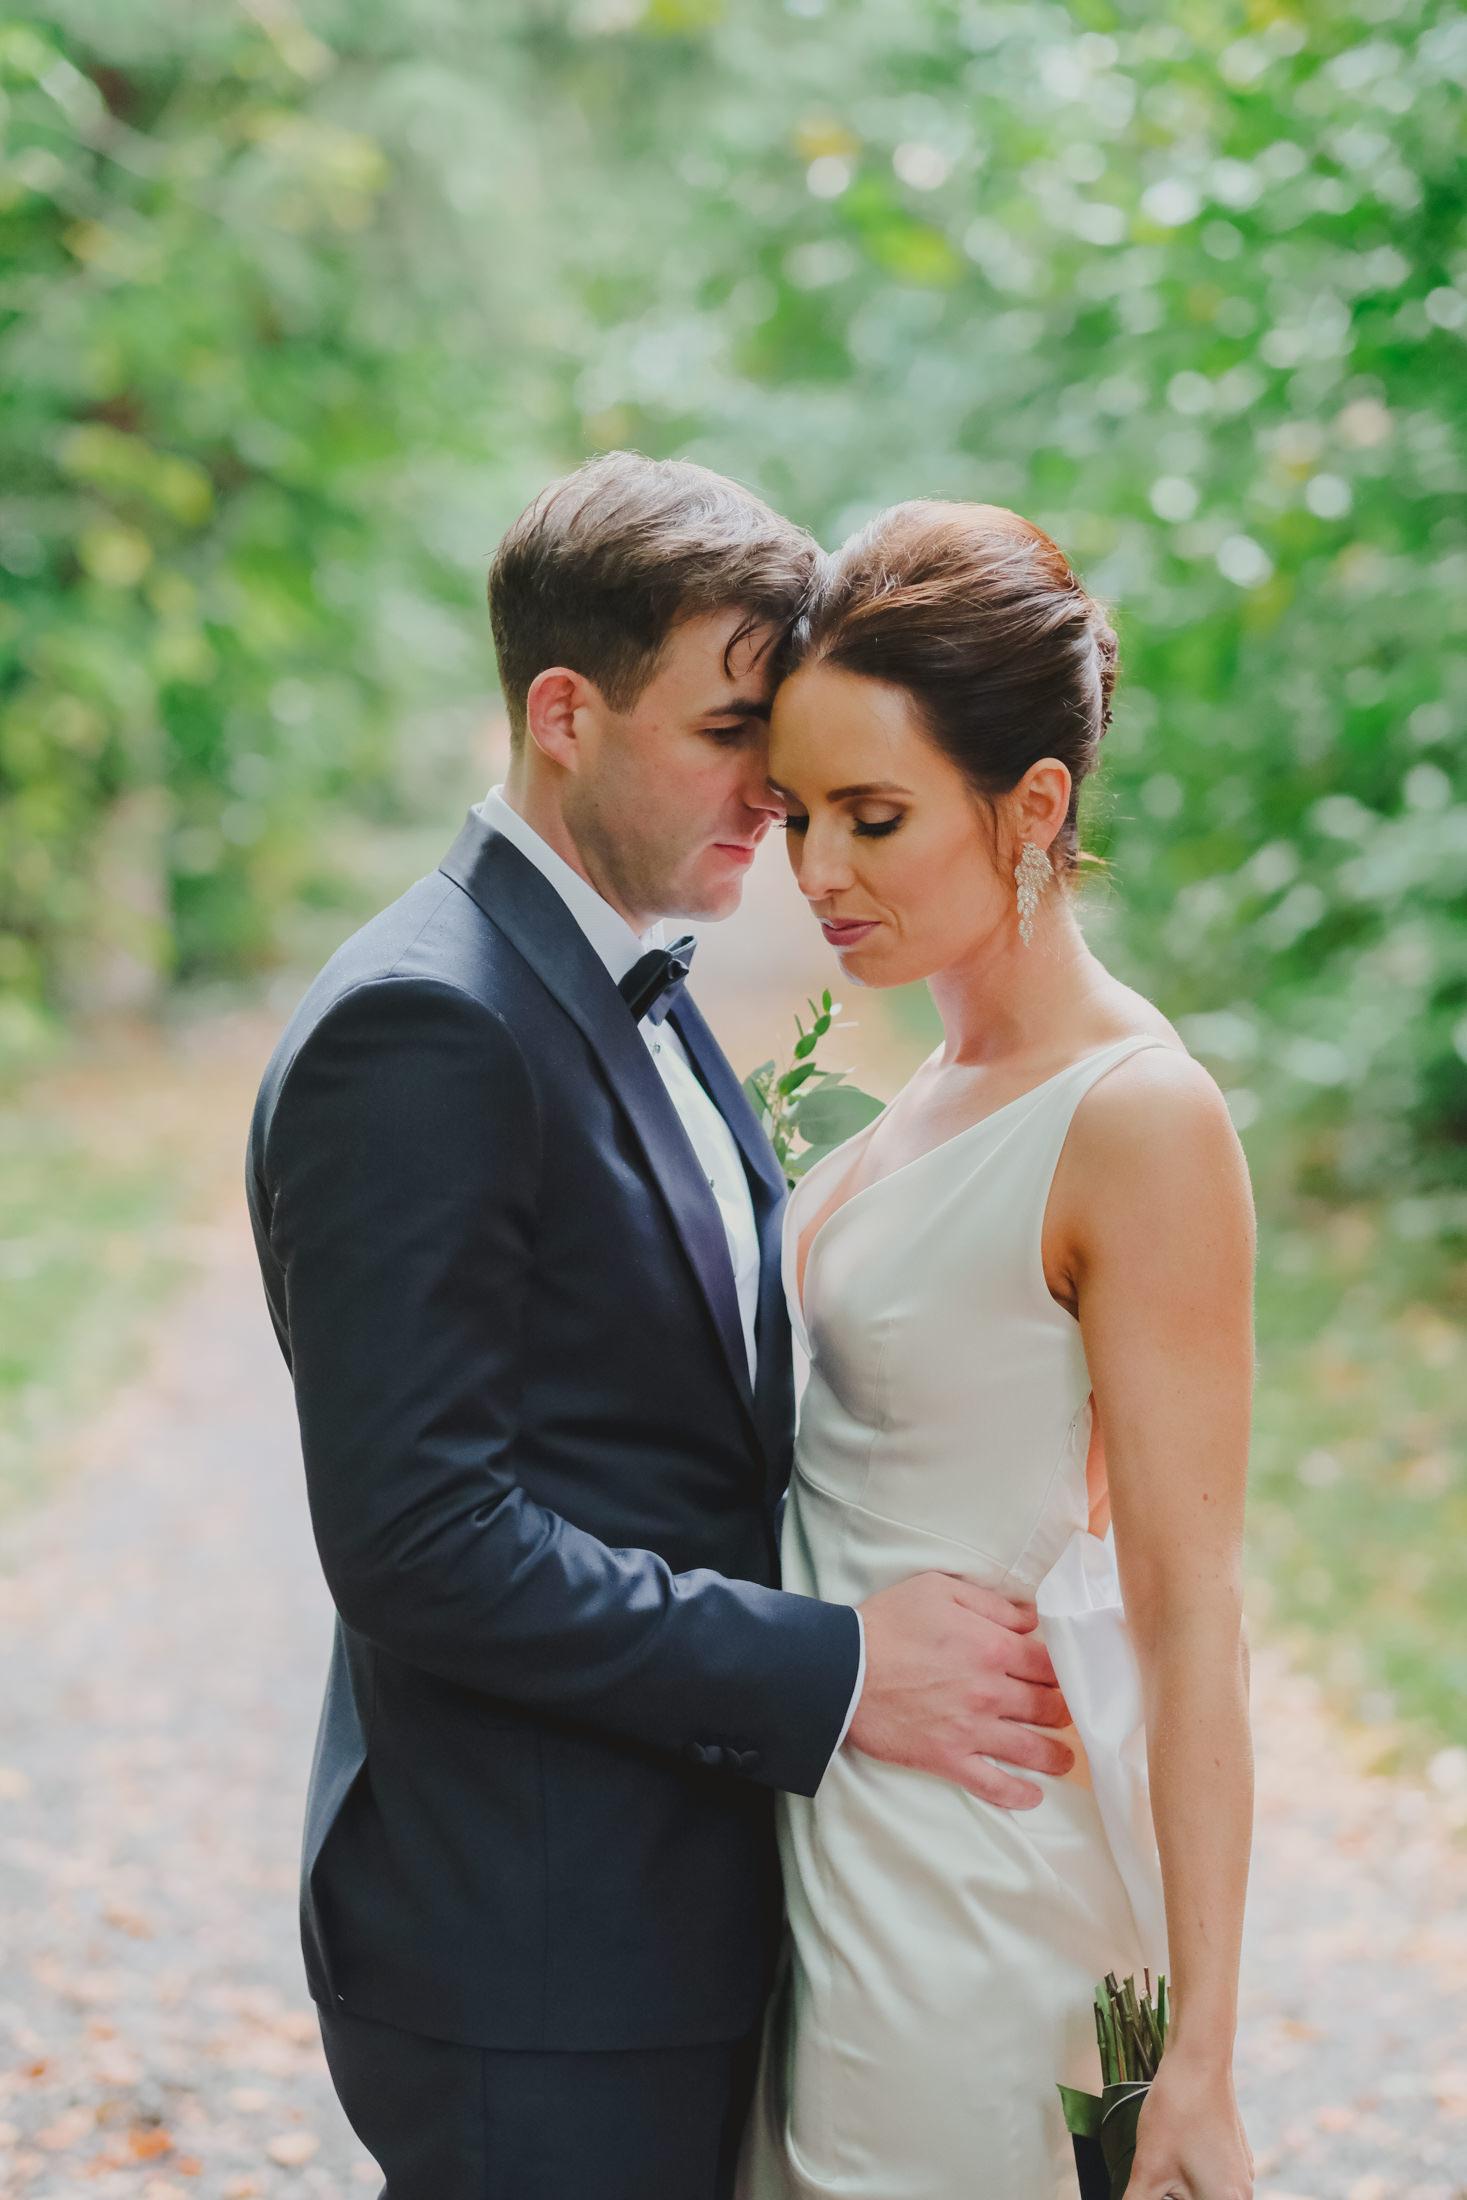 Aoibheann McCaul wedding 8